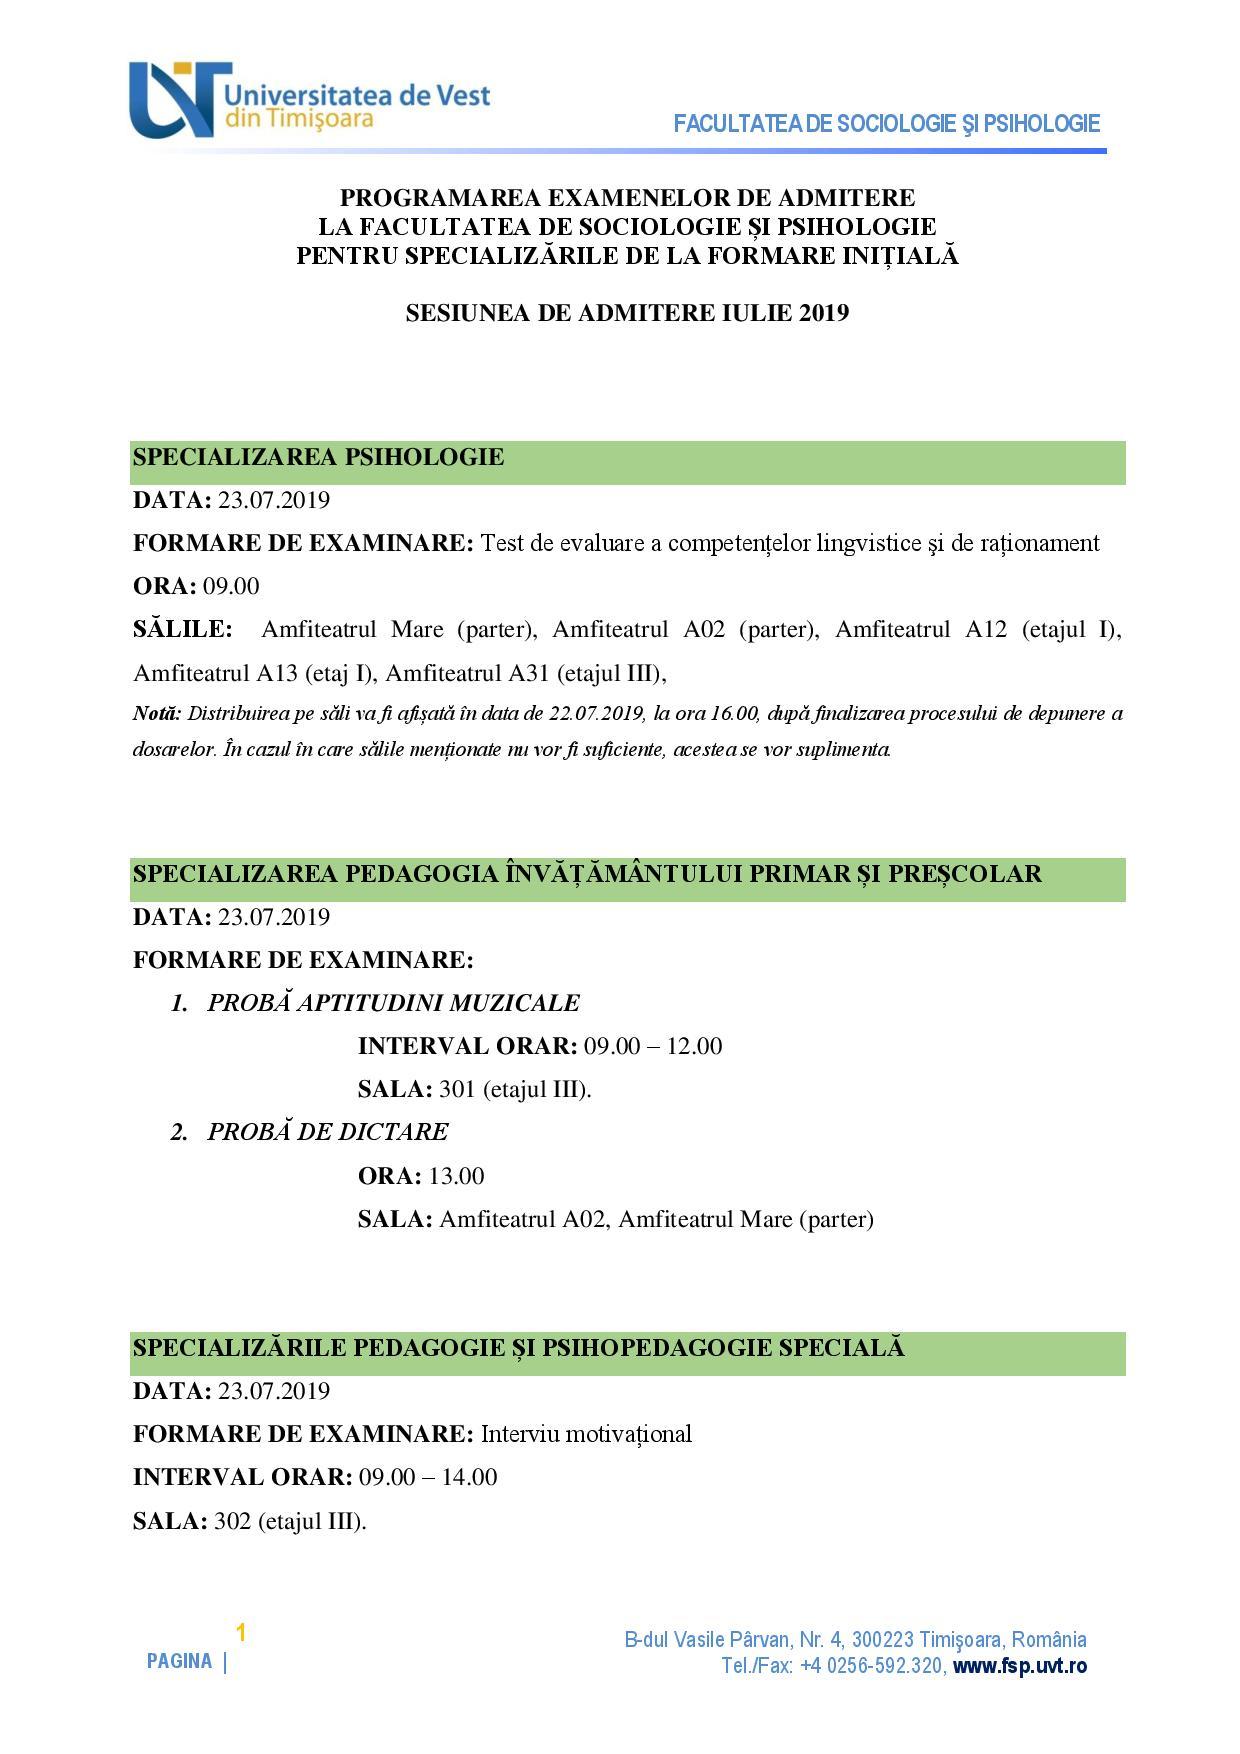 examen admitere iulie 2019 FSP